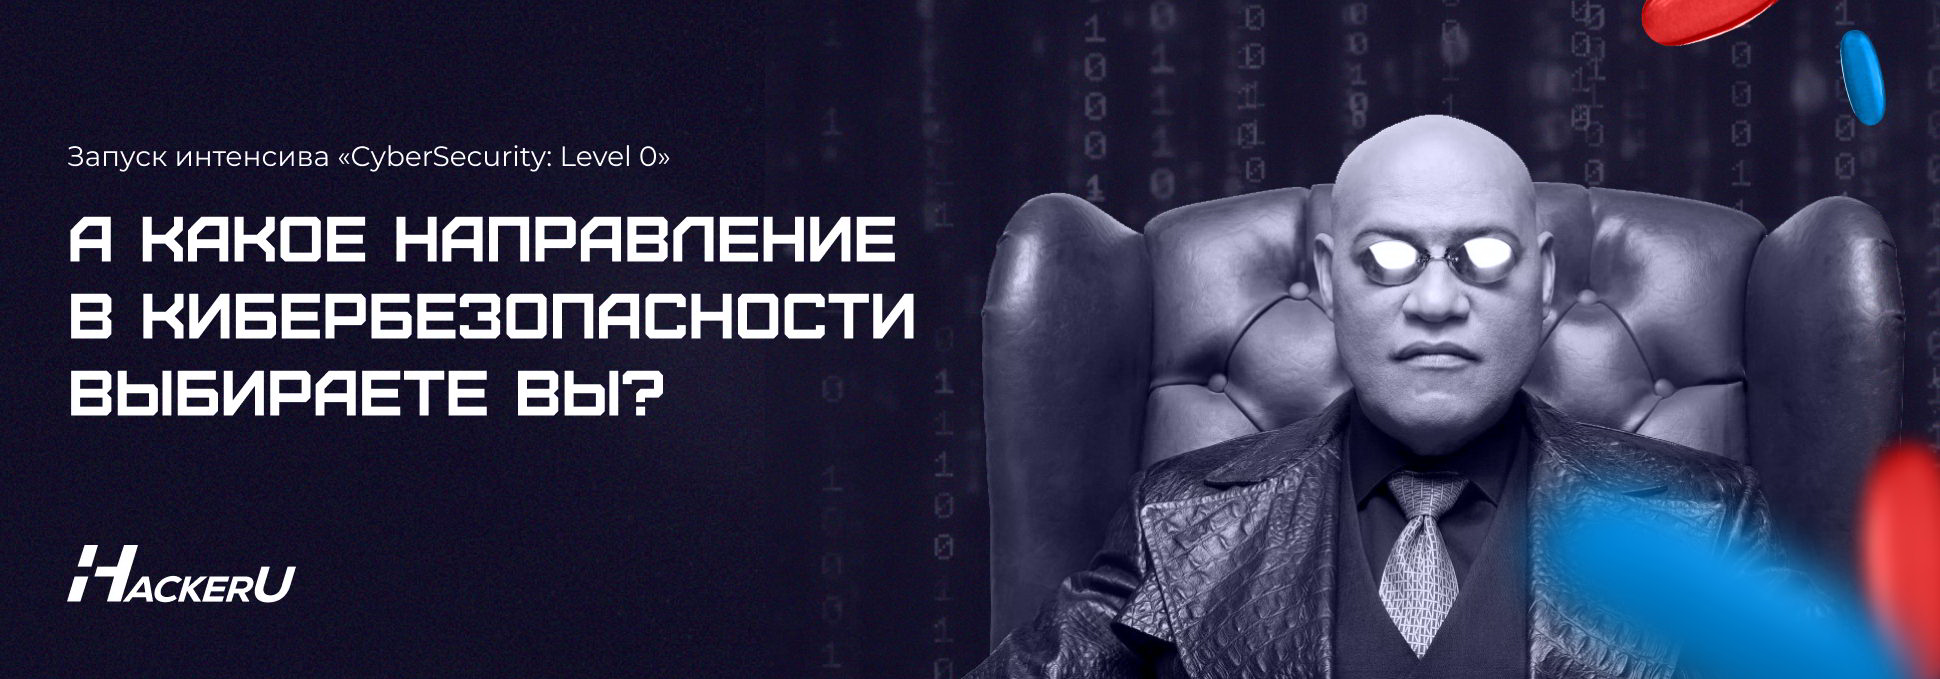 Определите свой путь в мире кибербезопасности на интенсиве «CyberSecurity: Level 0»